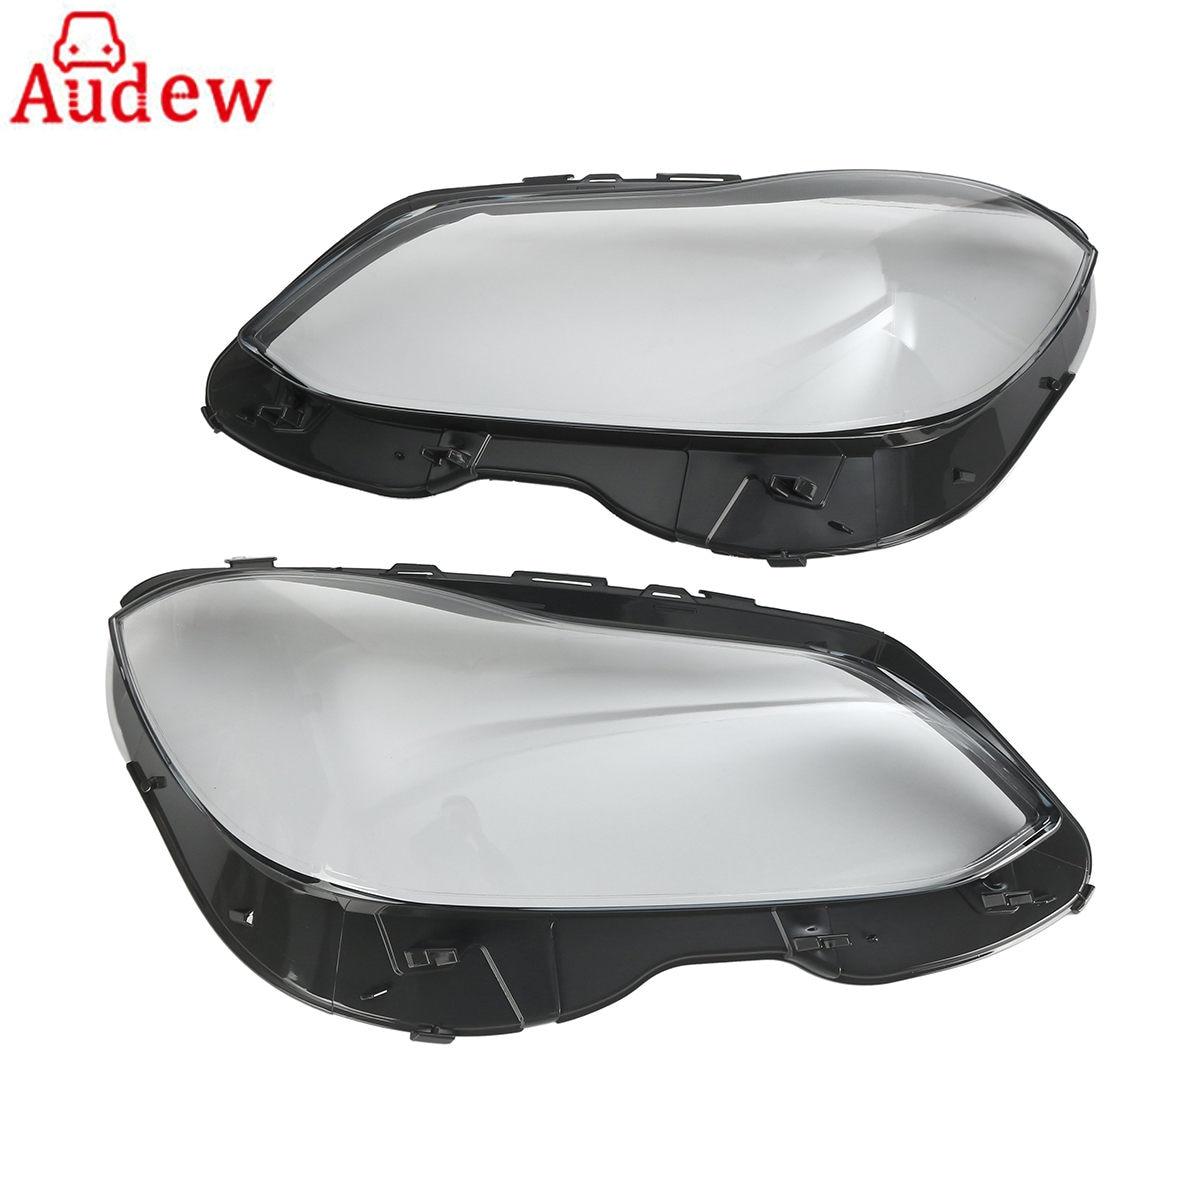 1Pair Car Front Headlight Headlamp Lens Plastic Covers Clear Lens For Mercedes-Benz E W212 Facelift QT